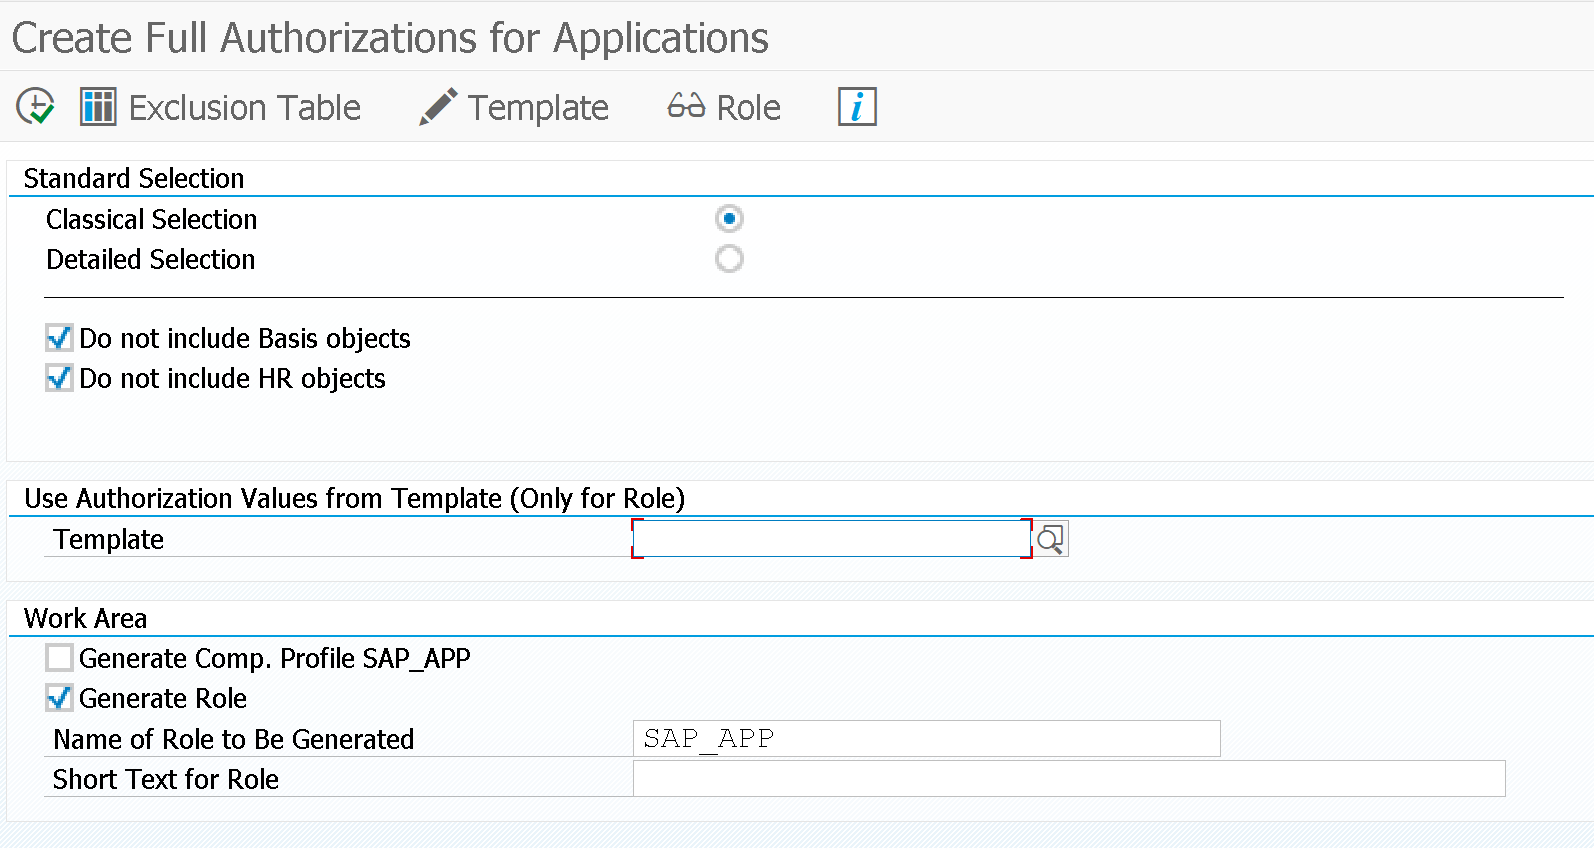 SAP_APP